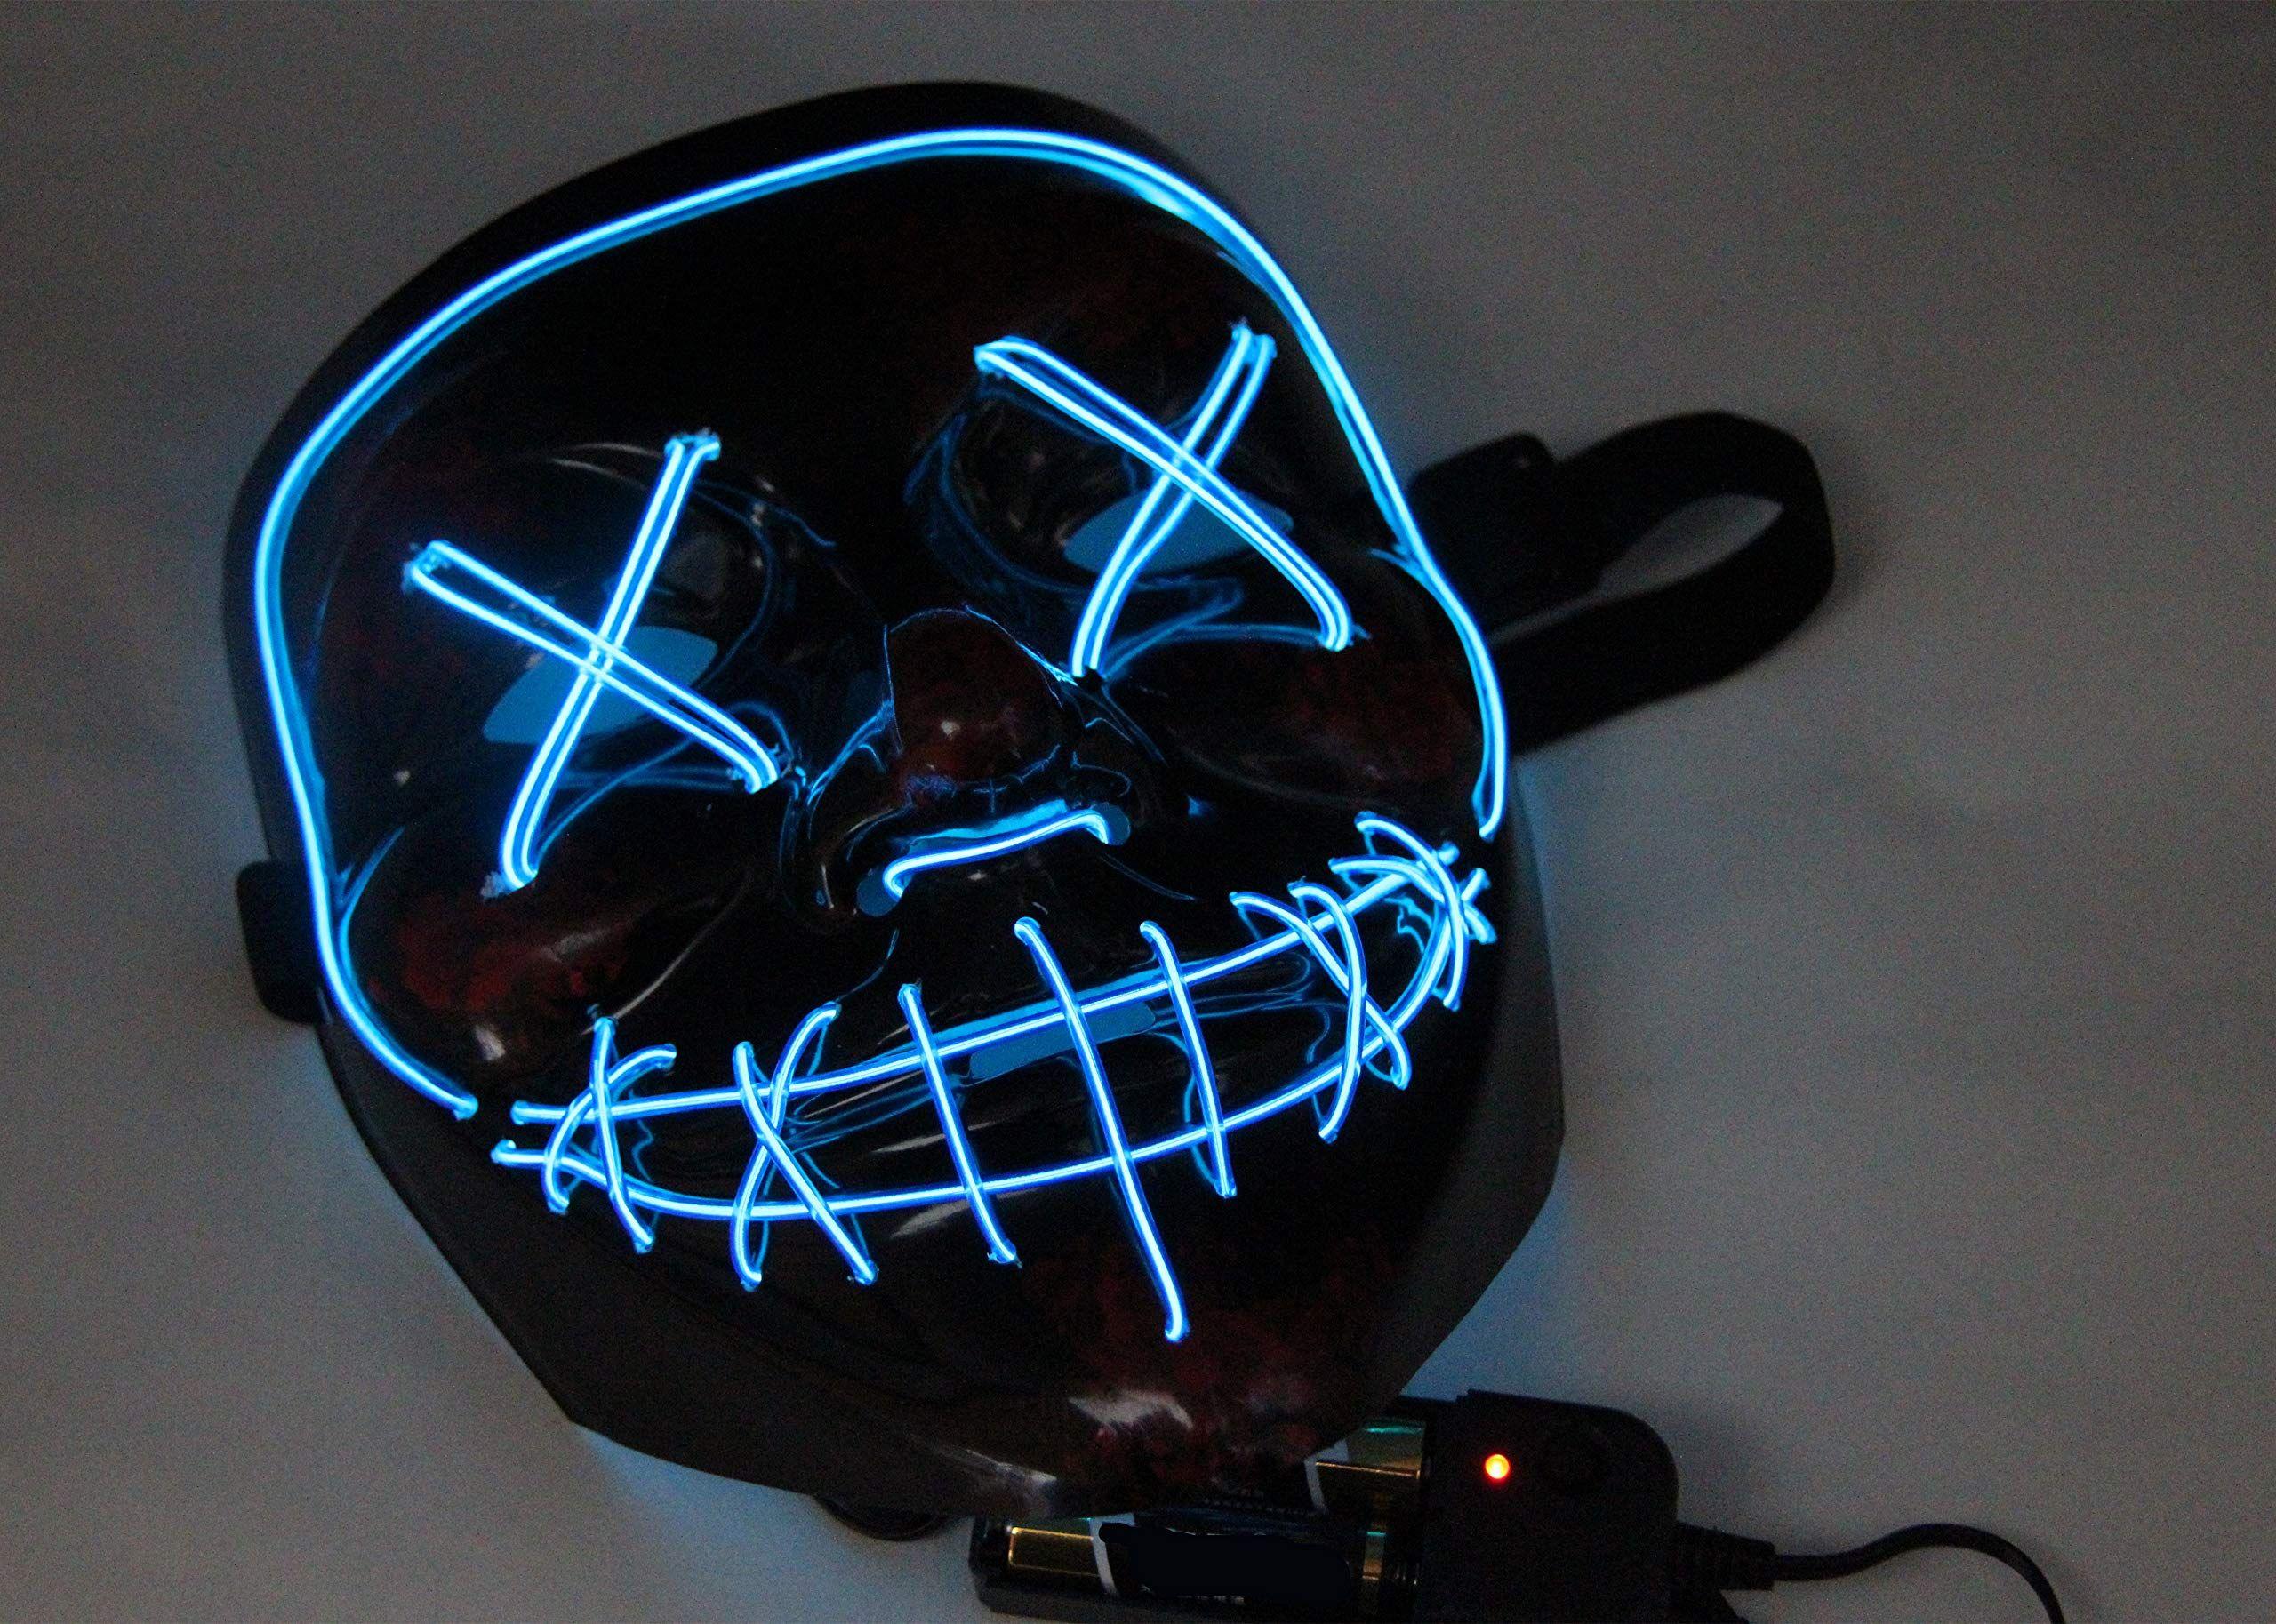 heytech Halloween Scary Mask Cosplay Led Costume Mask EL